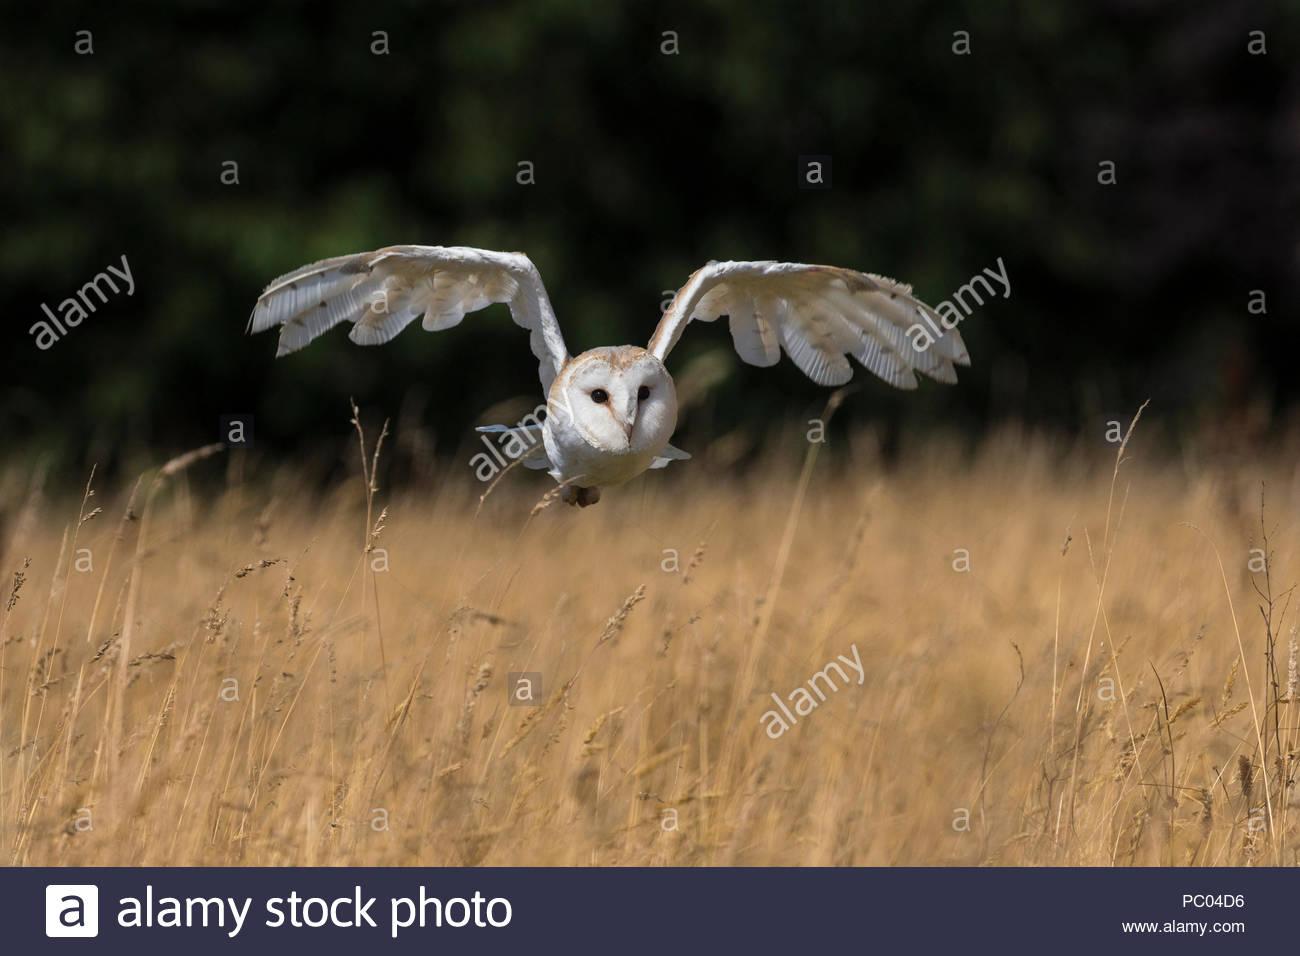 Barn owl (Tyto alba), captive, Cumbria, UK - Stock Image